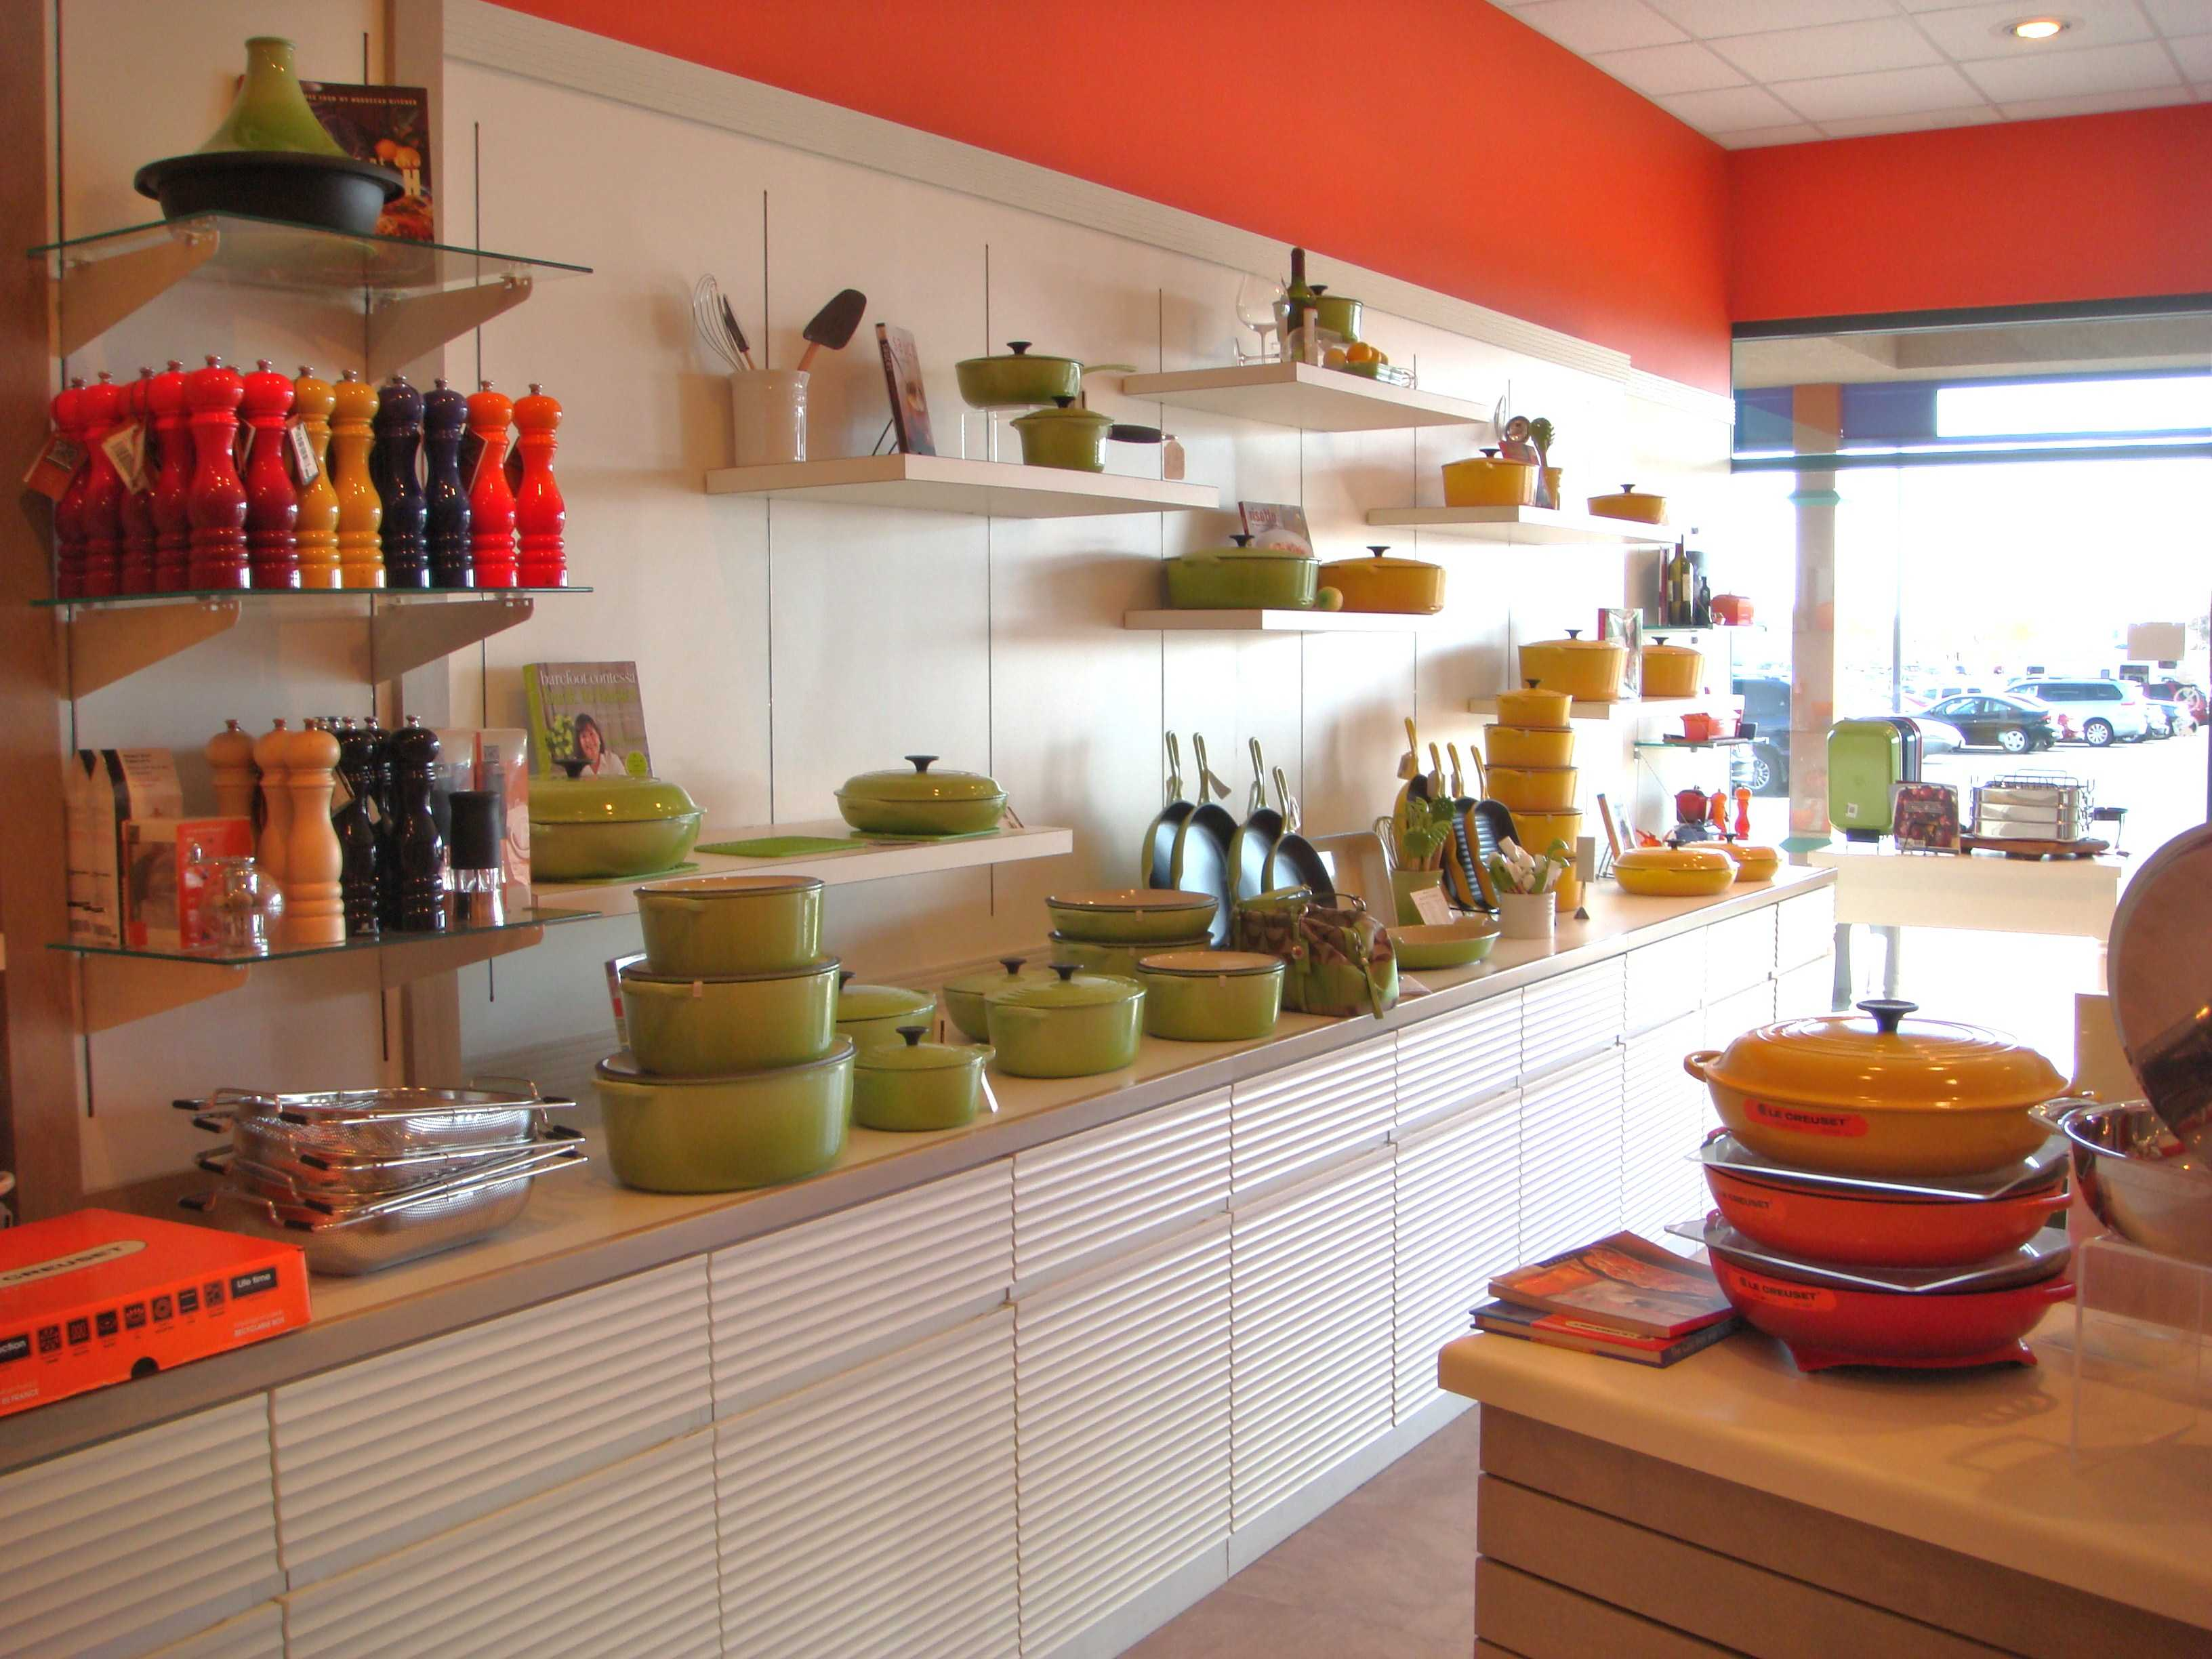 lowes kitchen cabinets sale chandeliers 厨房 收藏夹 知乎 lowes厨柜销售